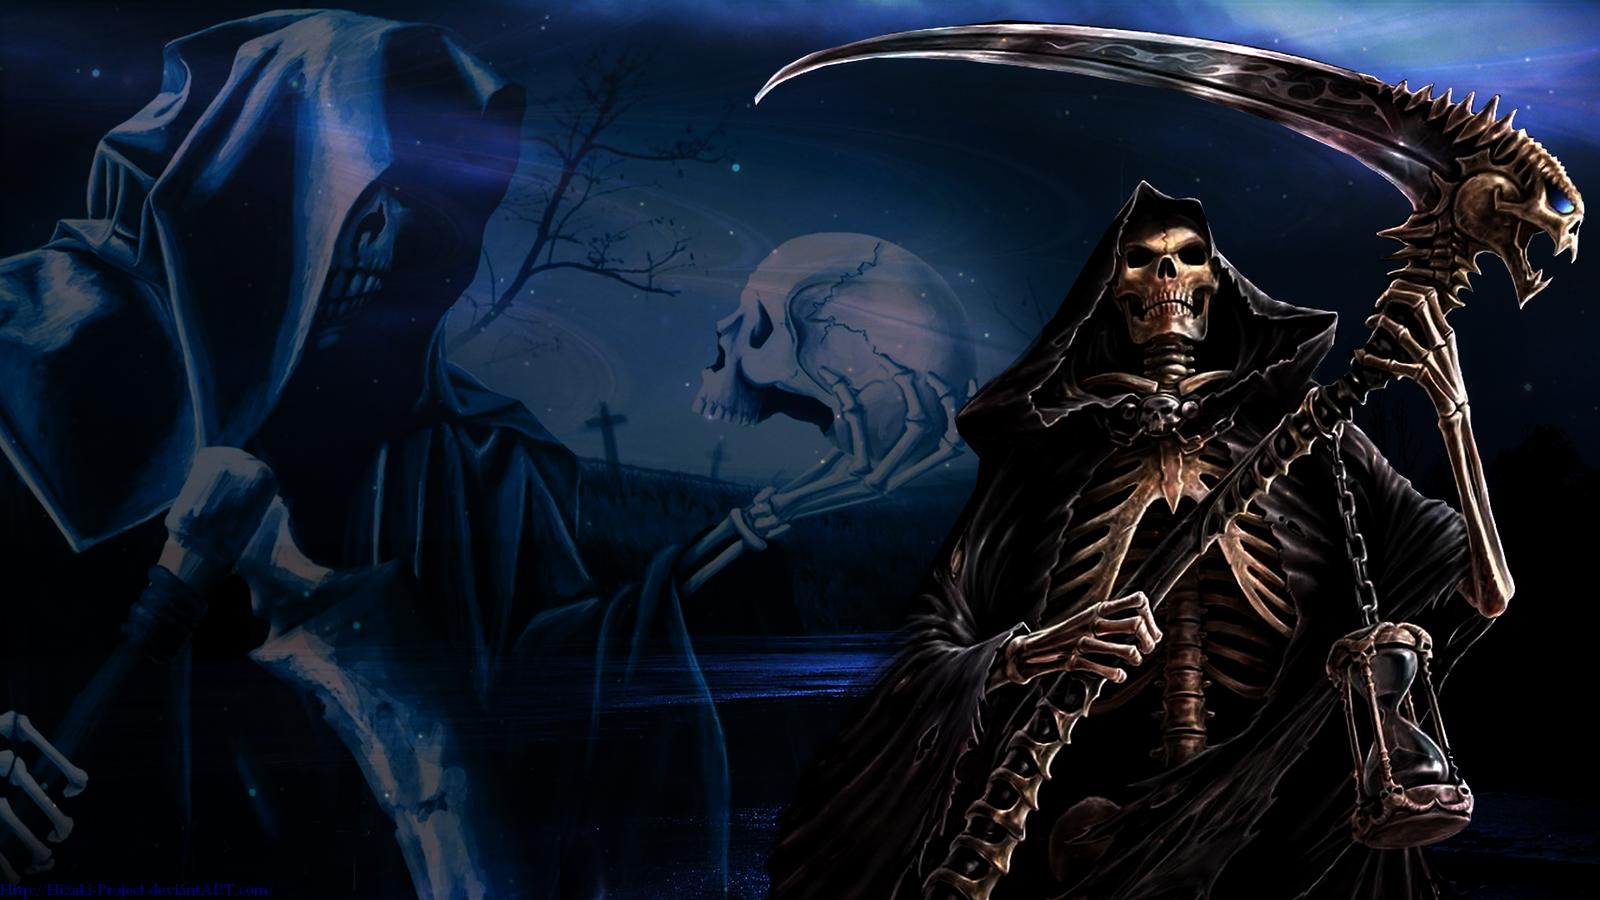 Grim Reaper Wallpaper HD wallpaper background 1600x900